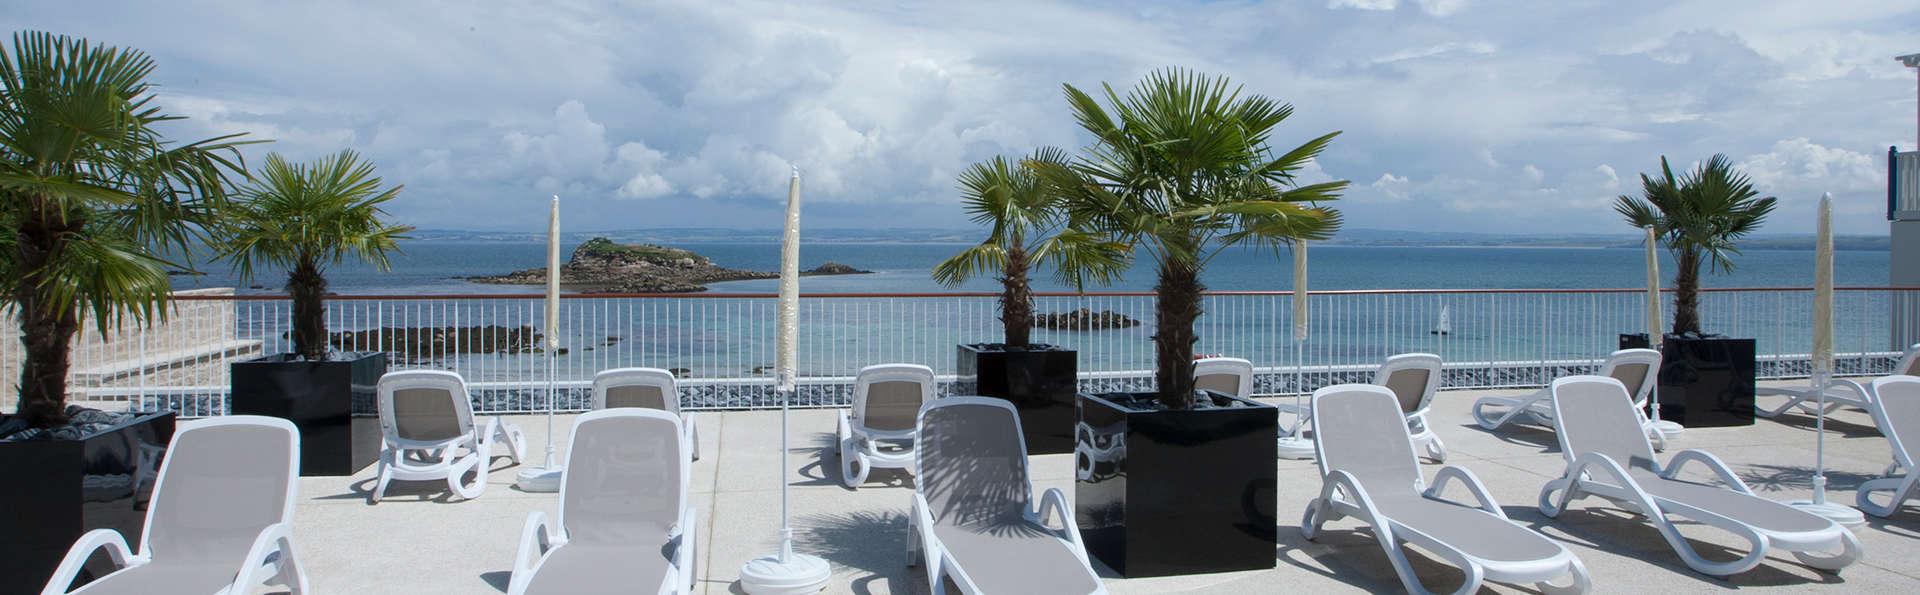 Repos absolu au bord de la mer sur la côte bretonne